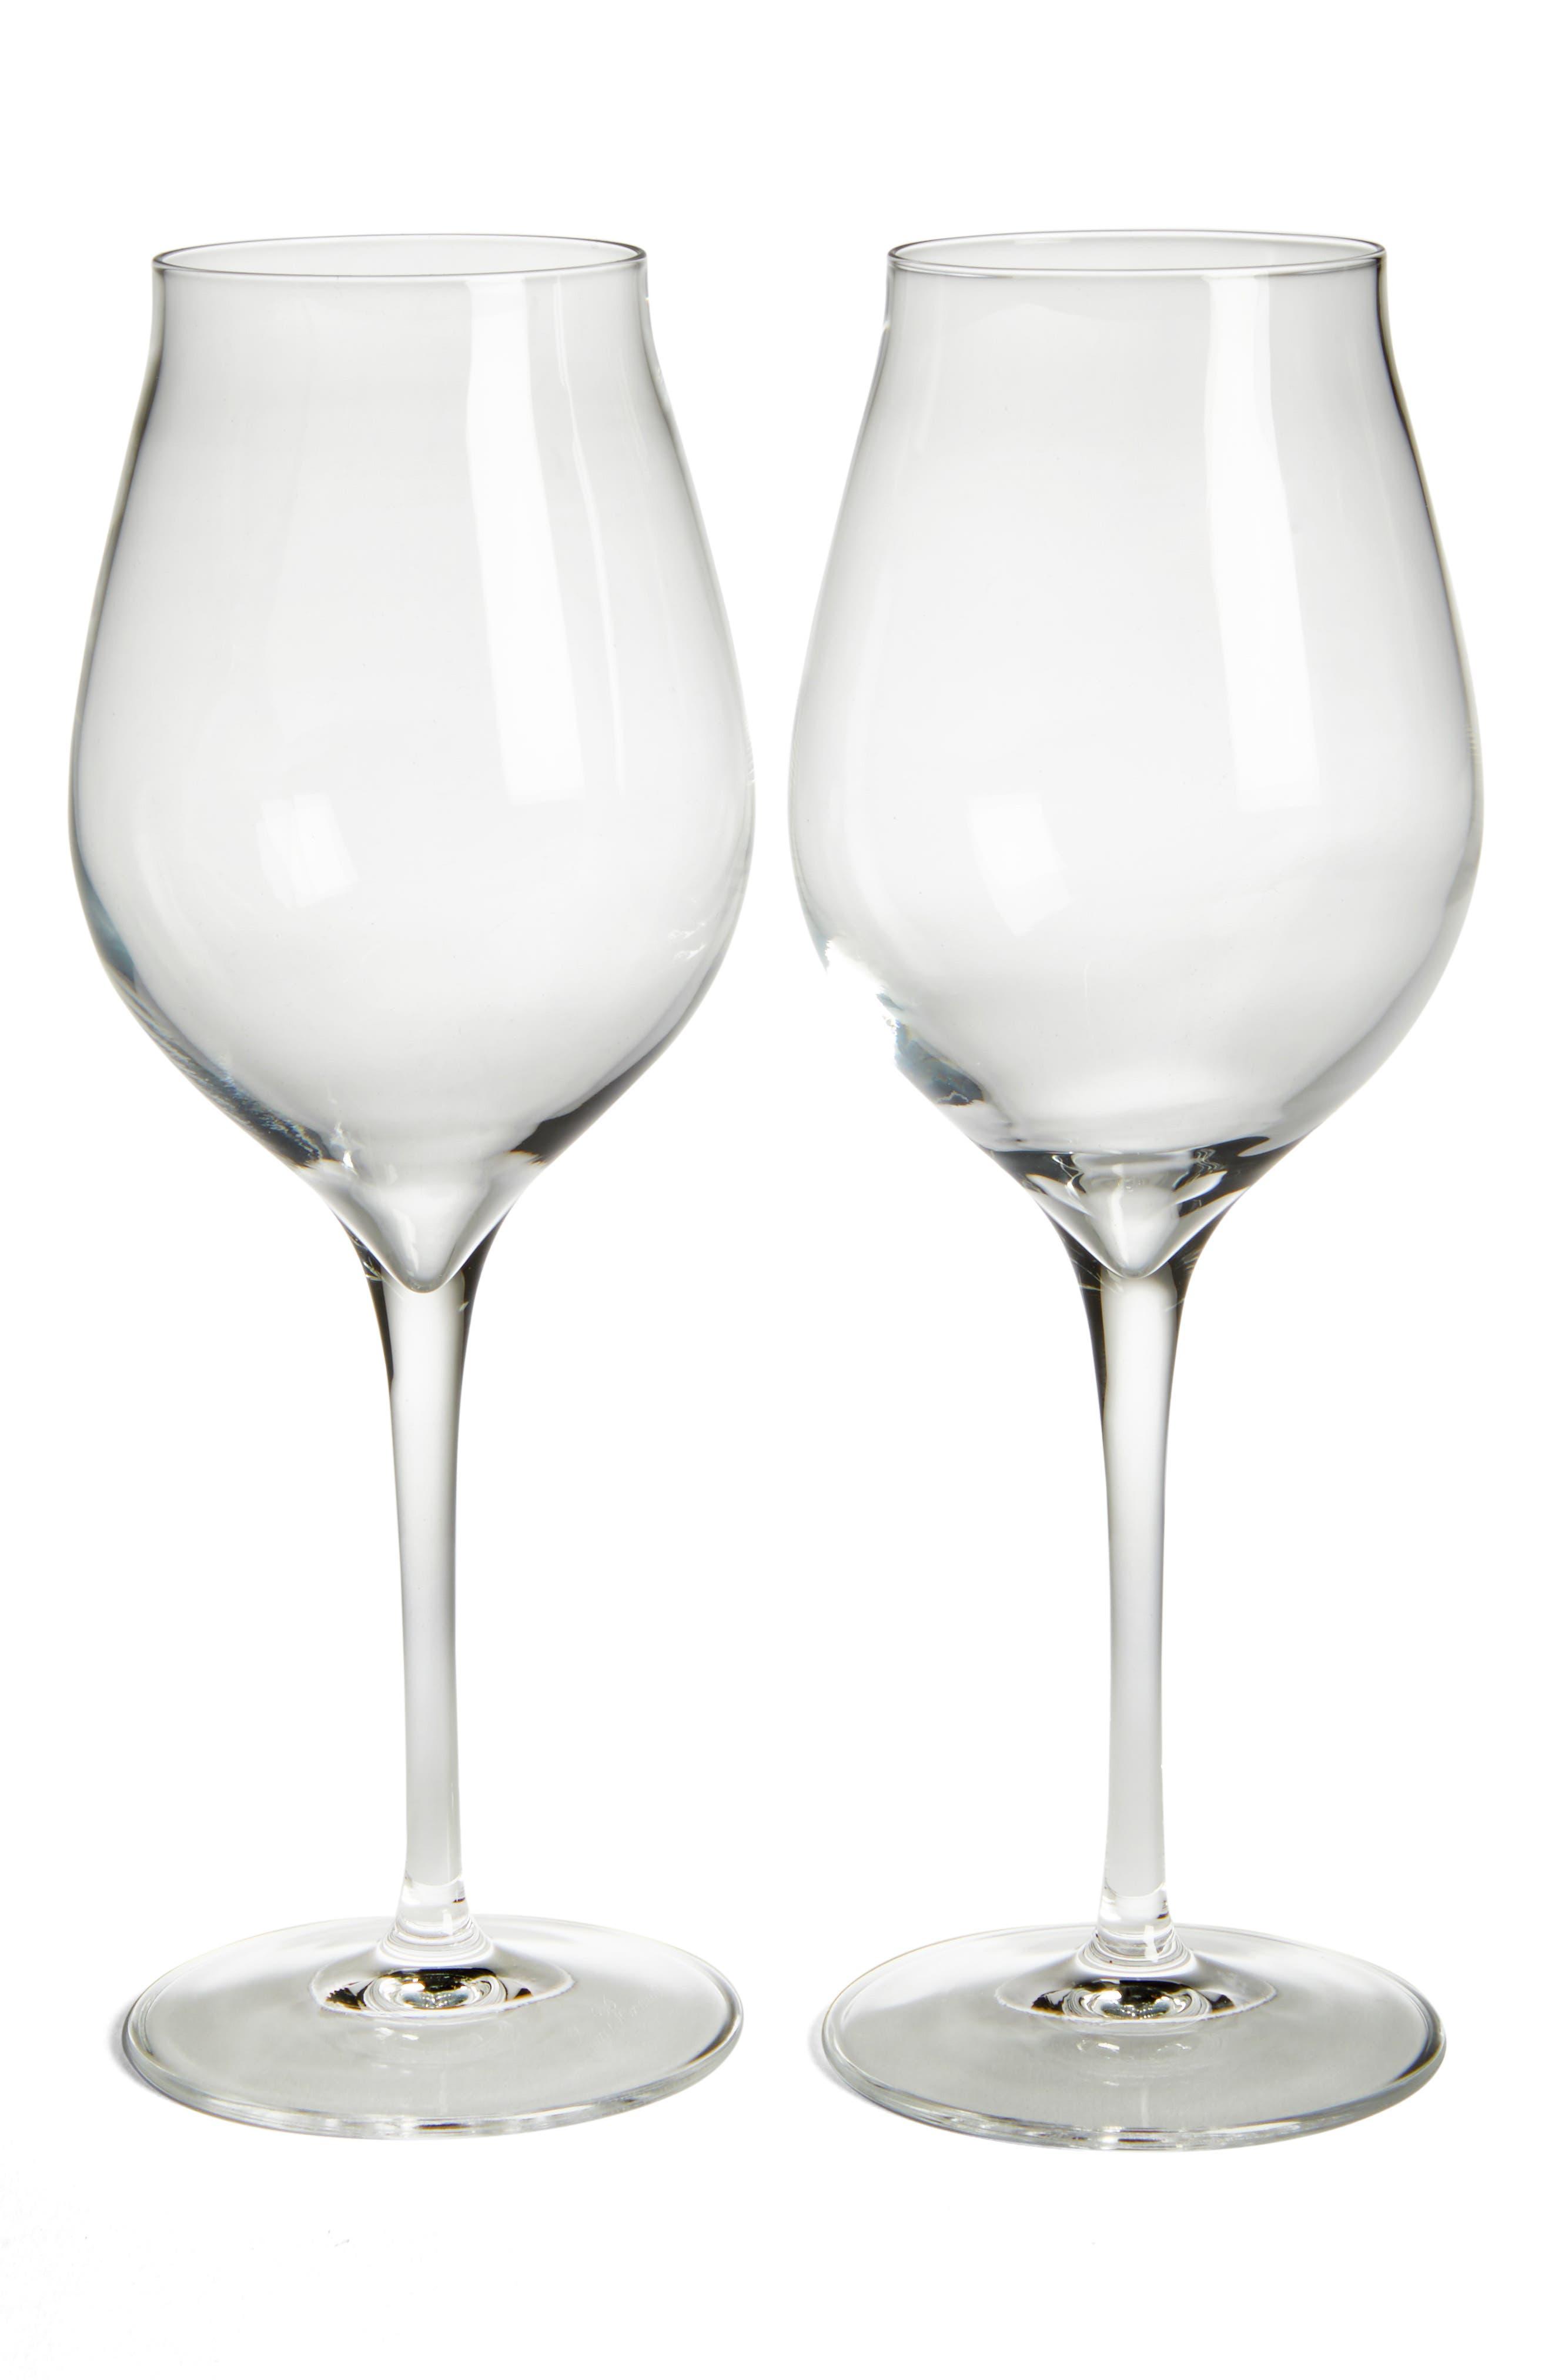 Main Image - Luigi Bormiolo Vinea Malvasia/Orvieto Set of 2 White Wine Glasses